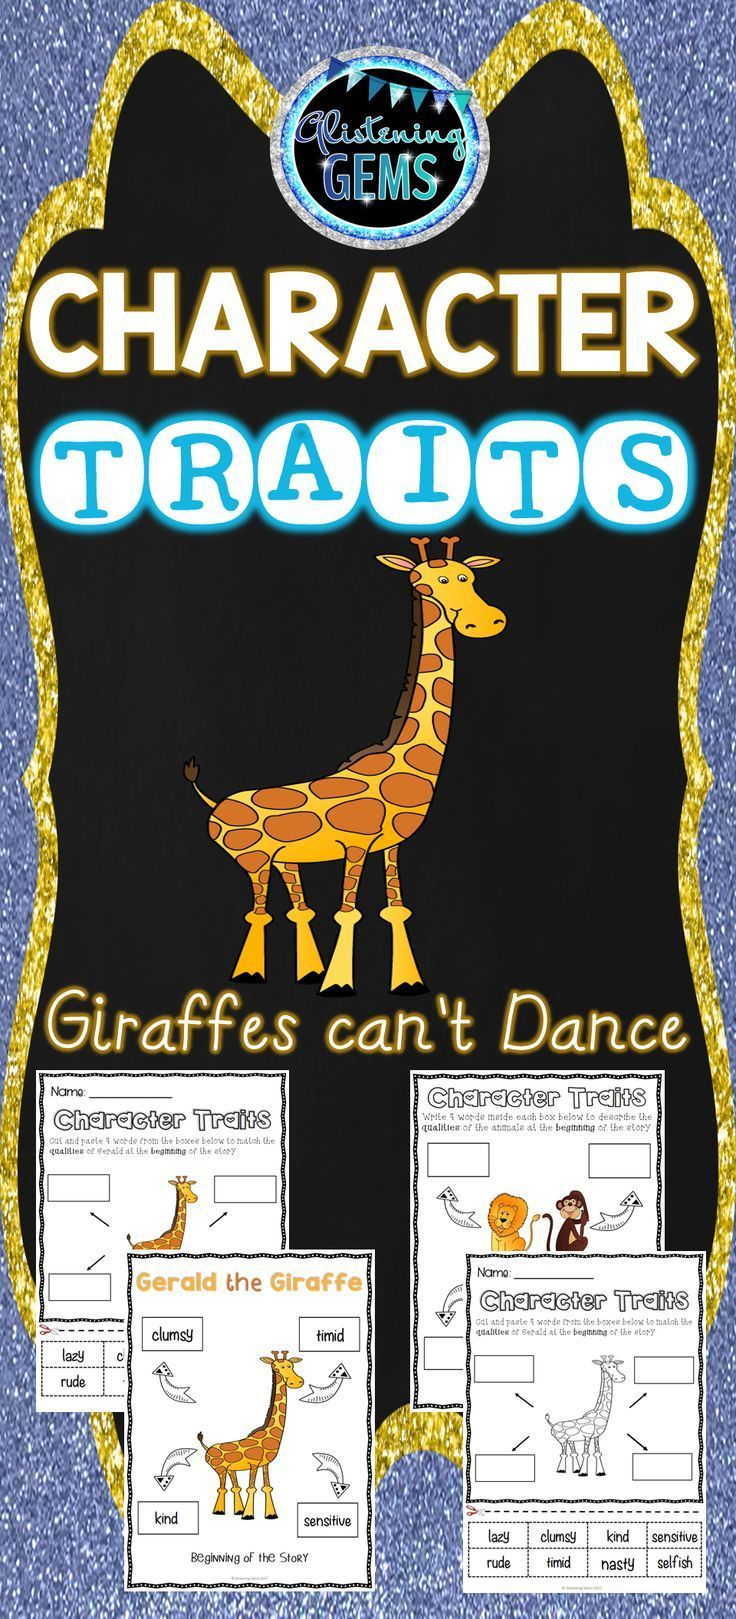 Giraffes cant dance character traits character traits